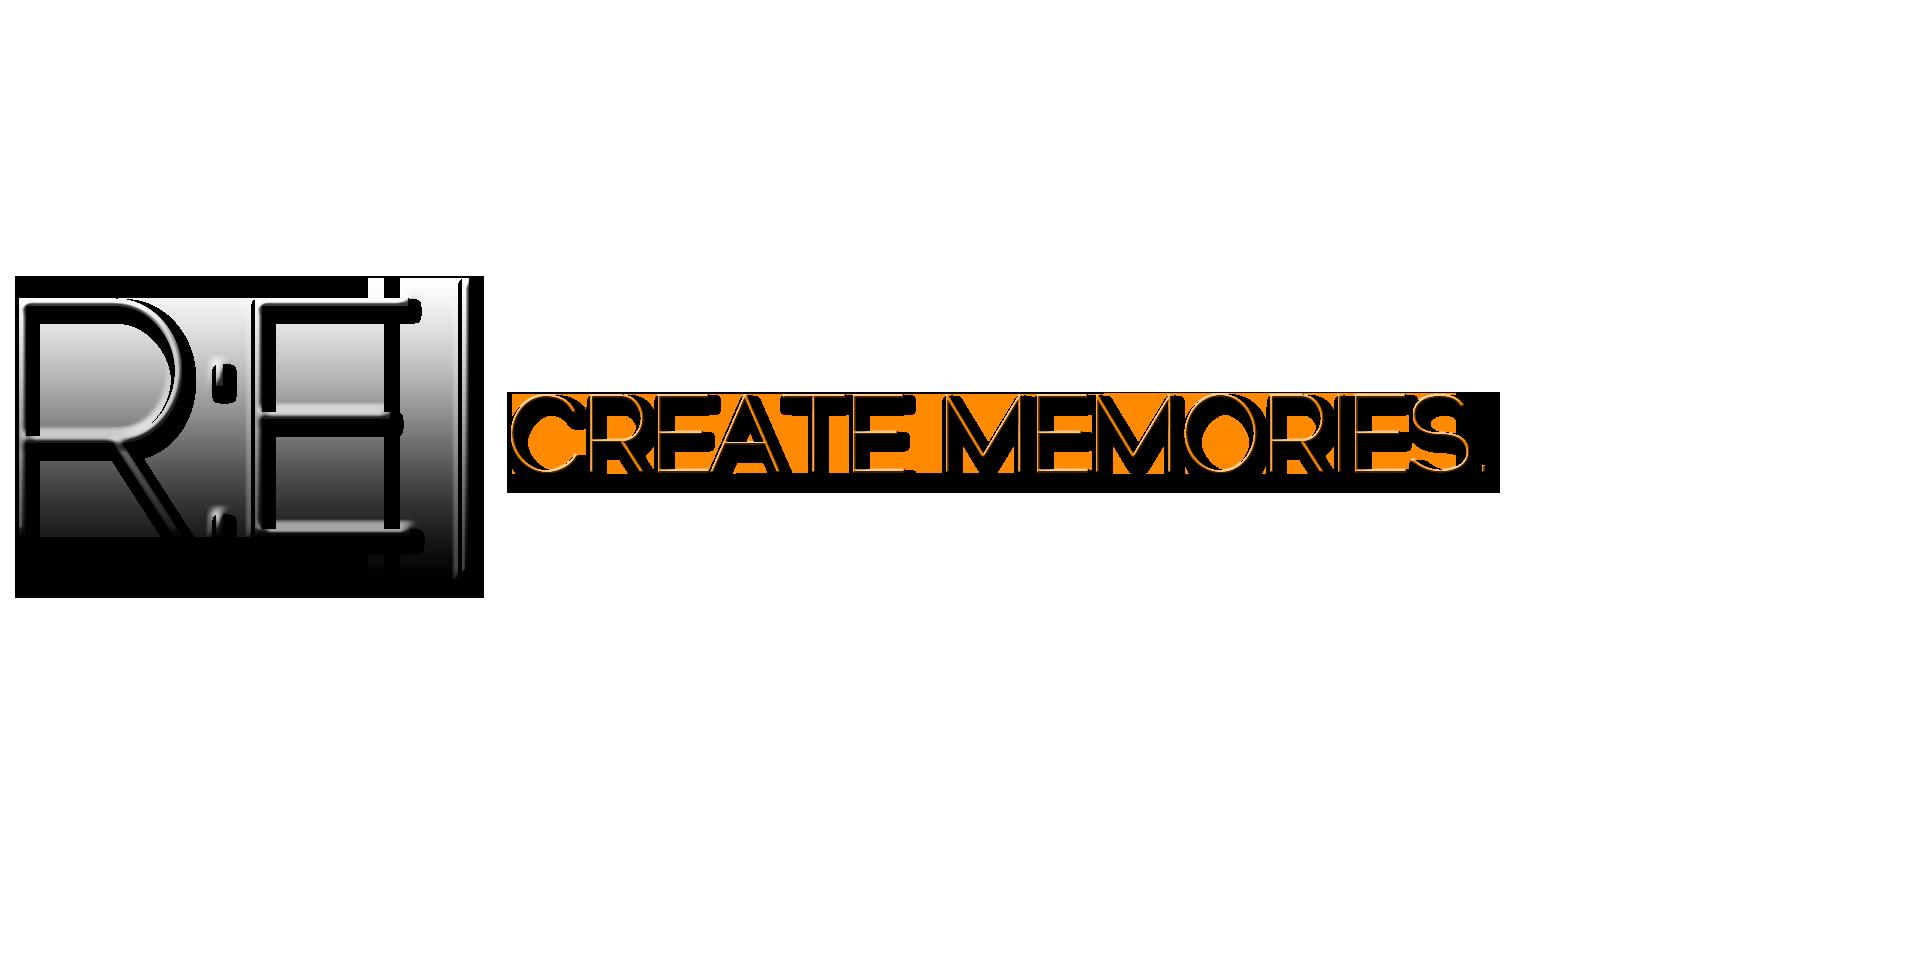 RE | CREATE MEMORIES.